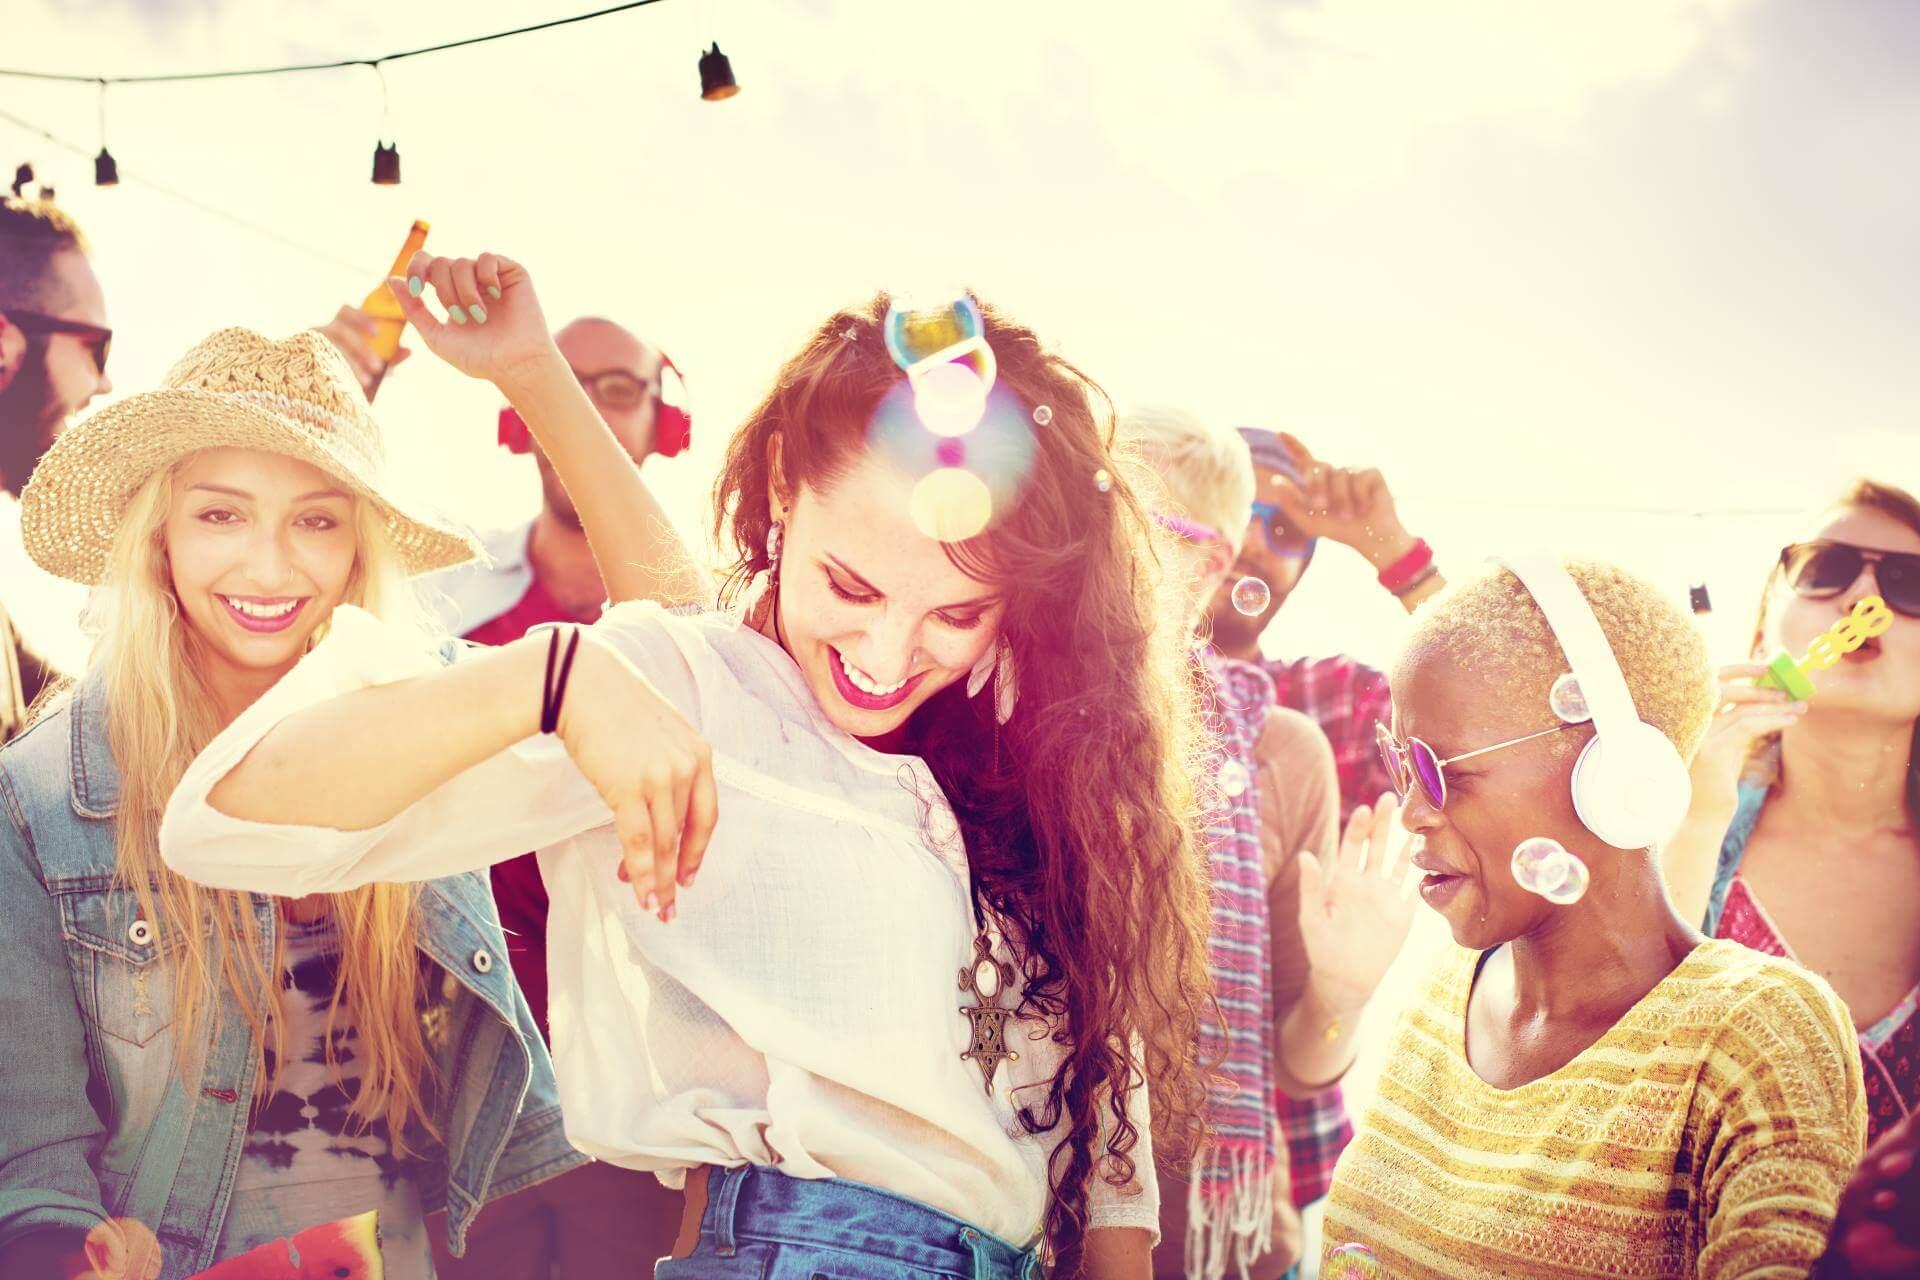 junge Frauen feiern am Strand